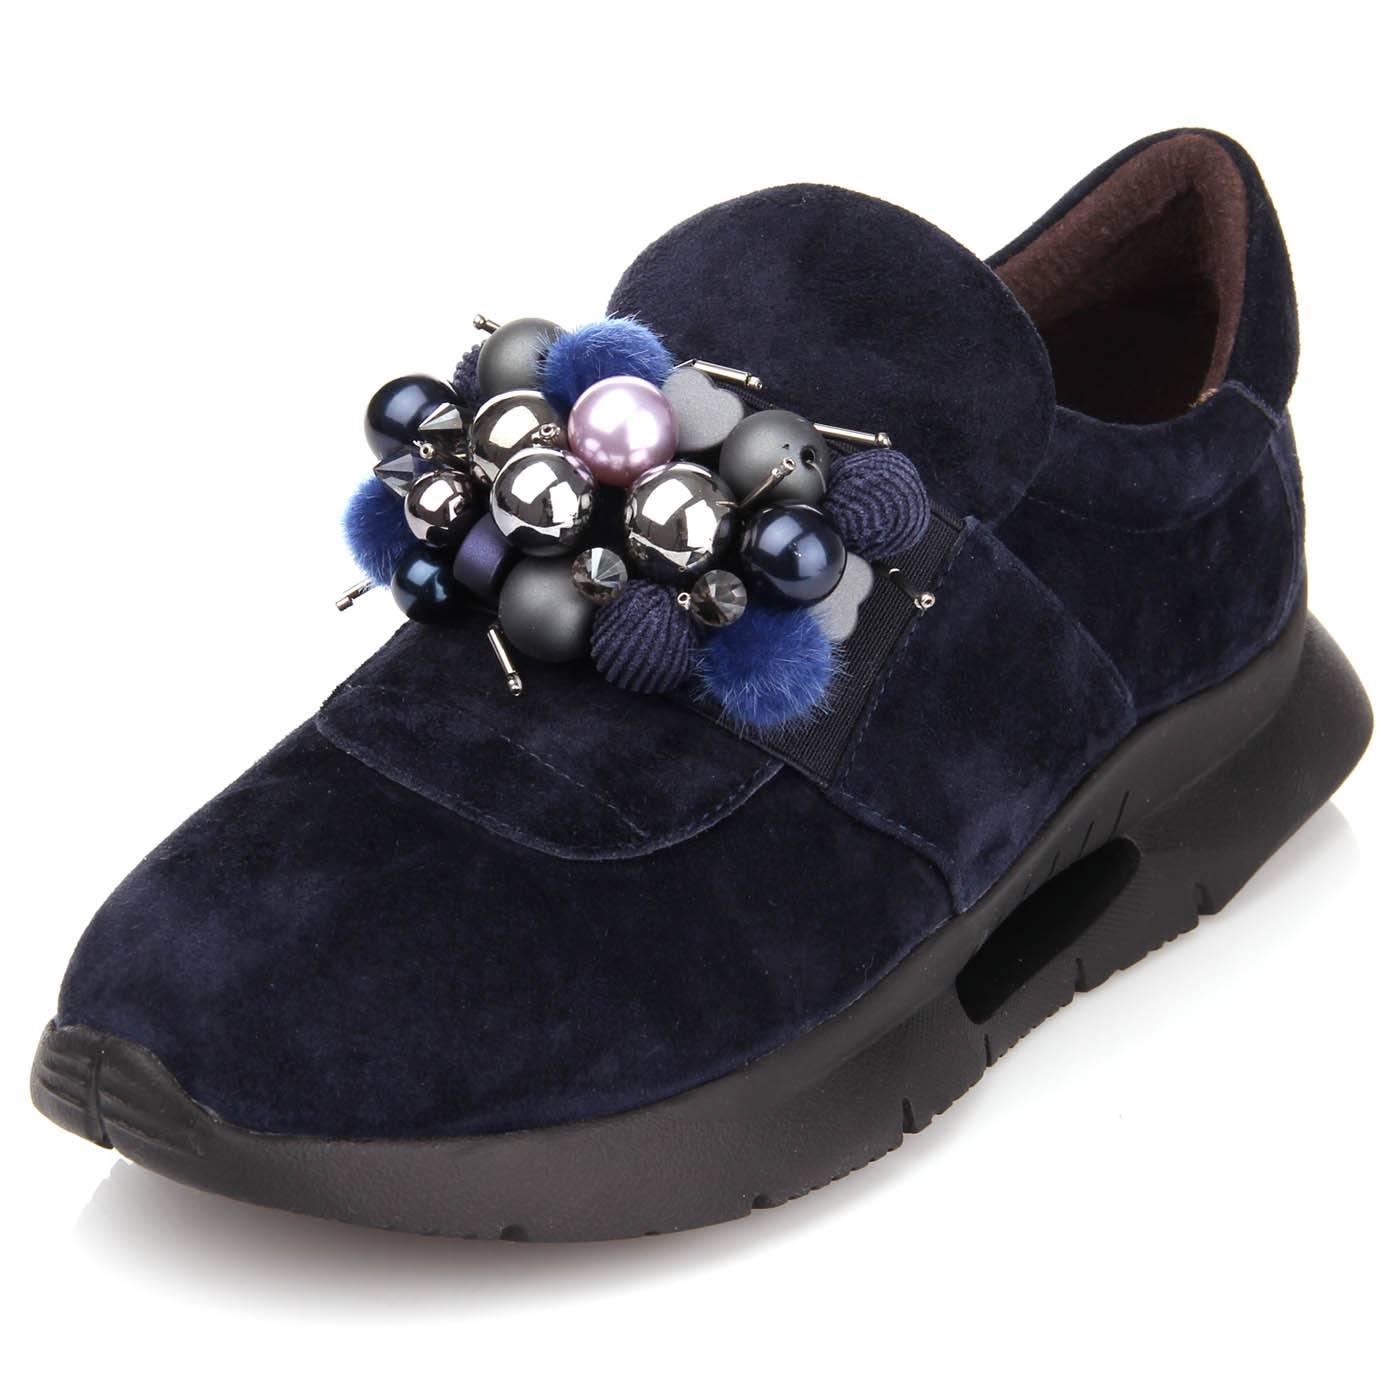 Кросівки жіночі ditto 6954 Синій купить по выгодной цене в интернет ... eff945aab7d0a